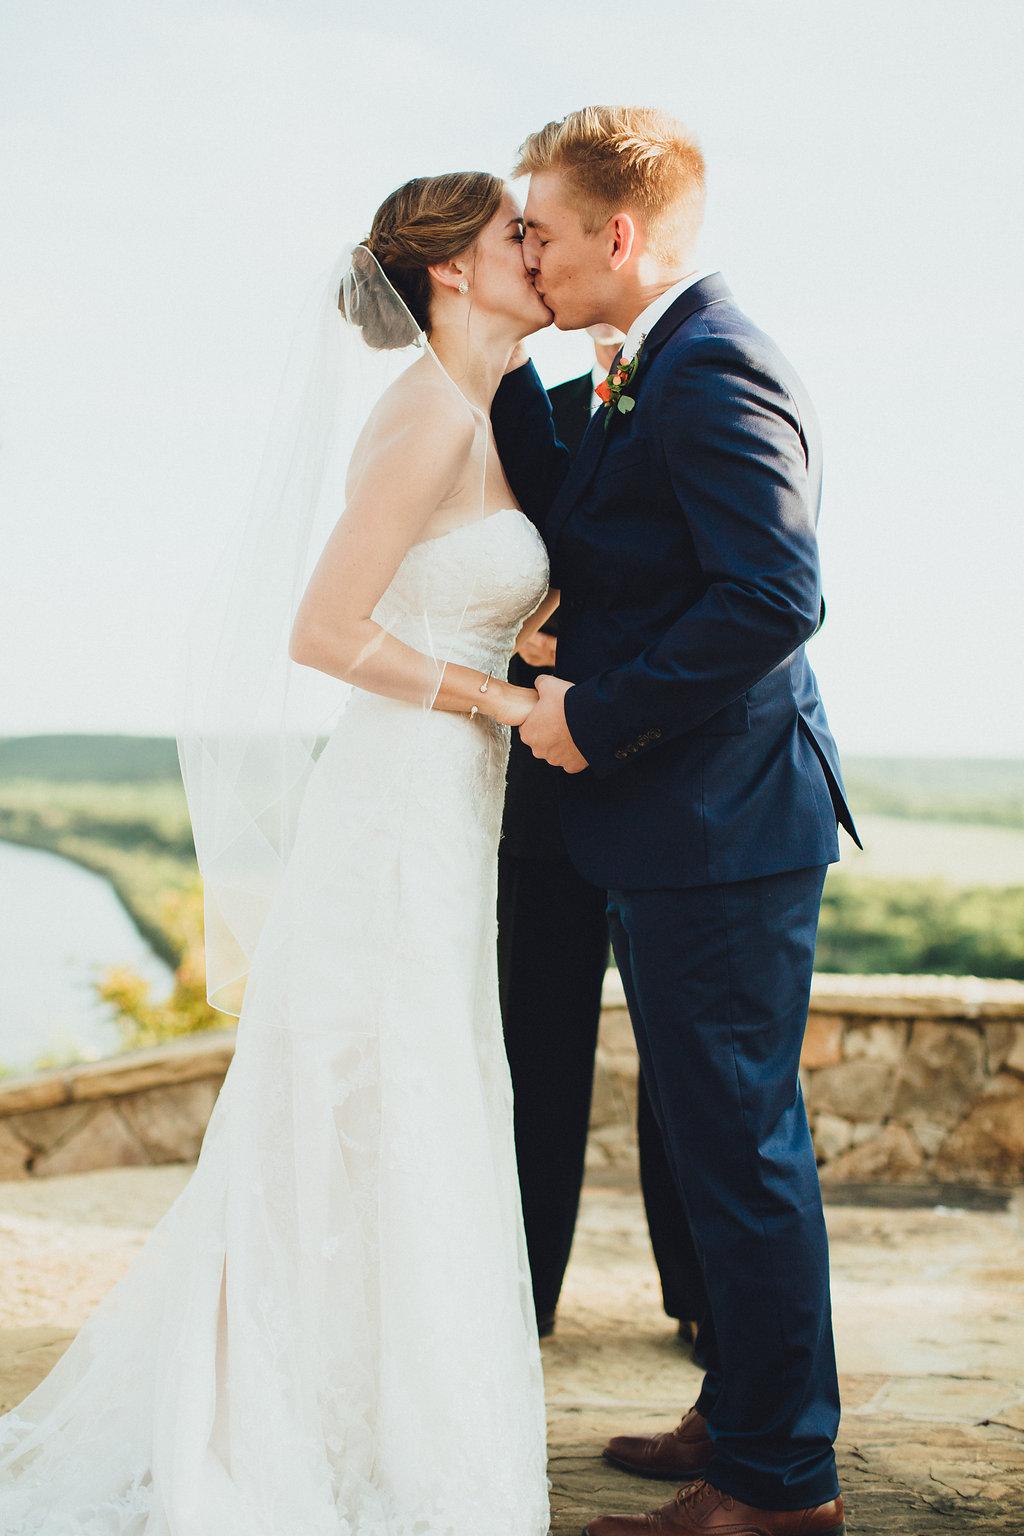 brian+annie_wedding-484.jpg